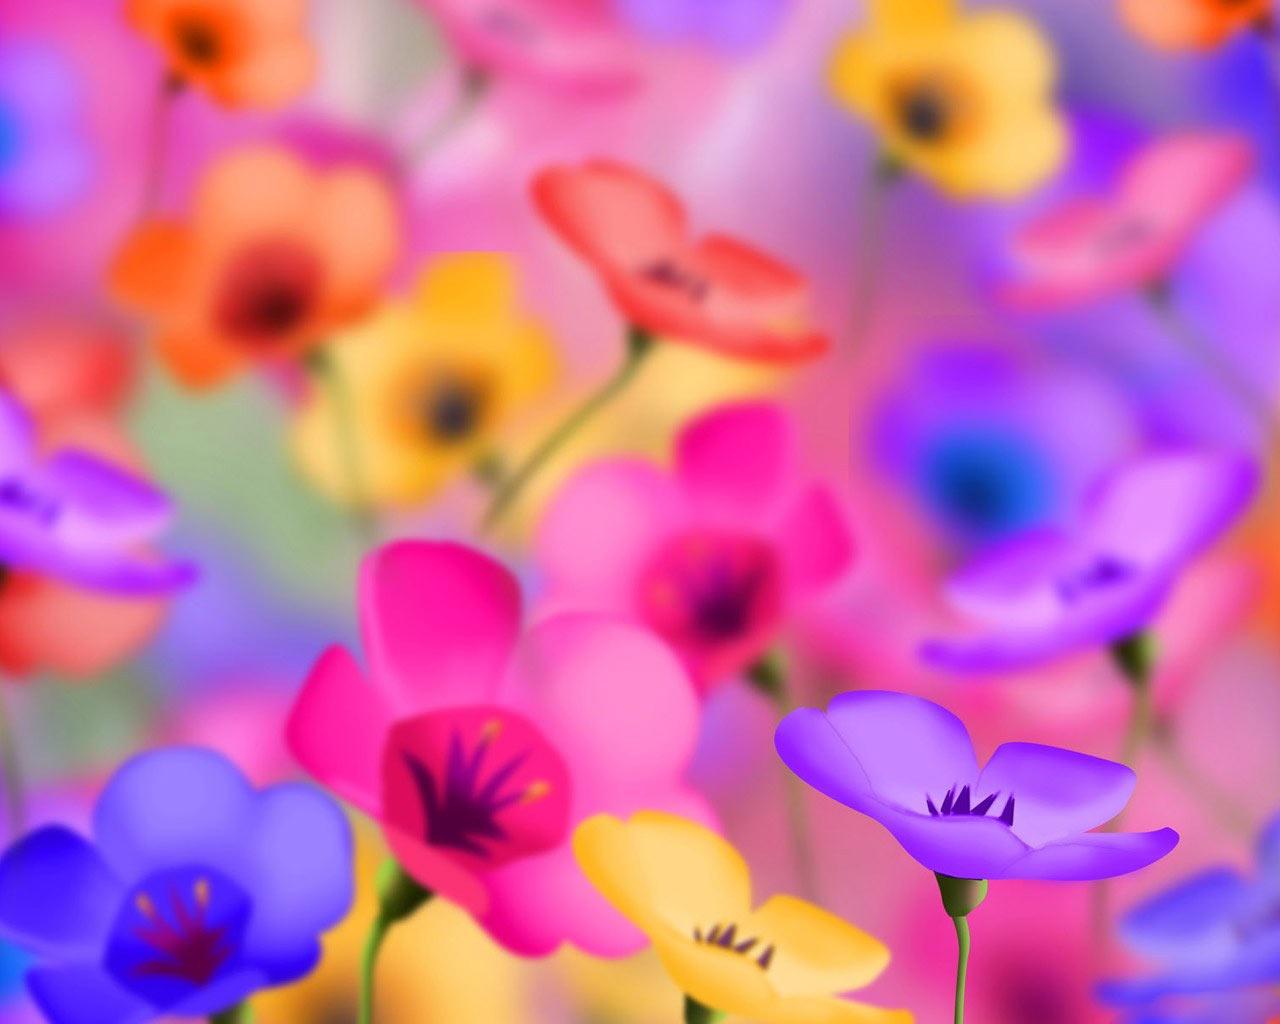 flowers for flower lovers Flowers background desktop wallpapers 1280x1024